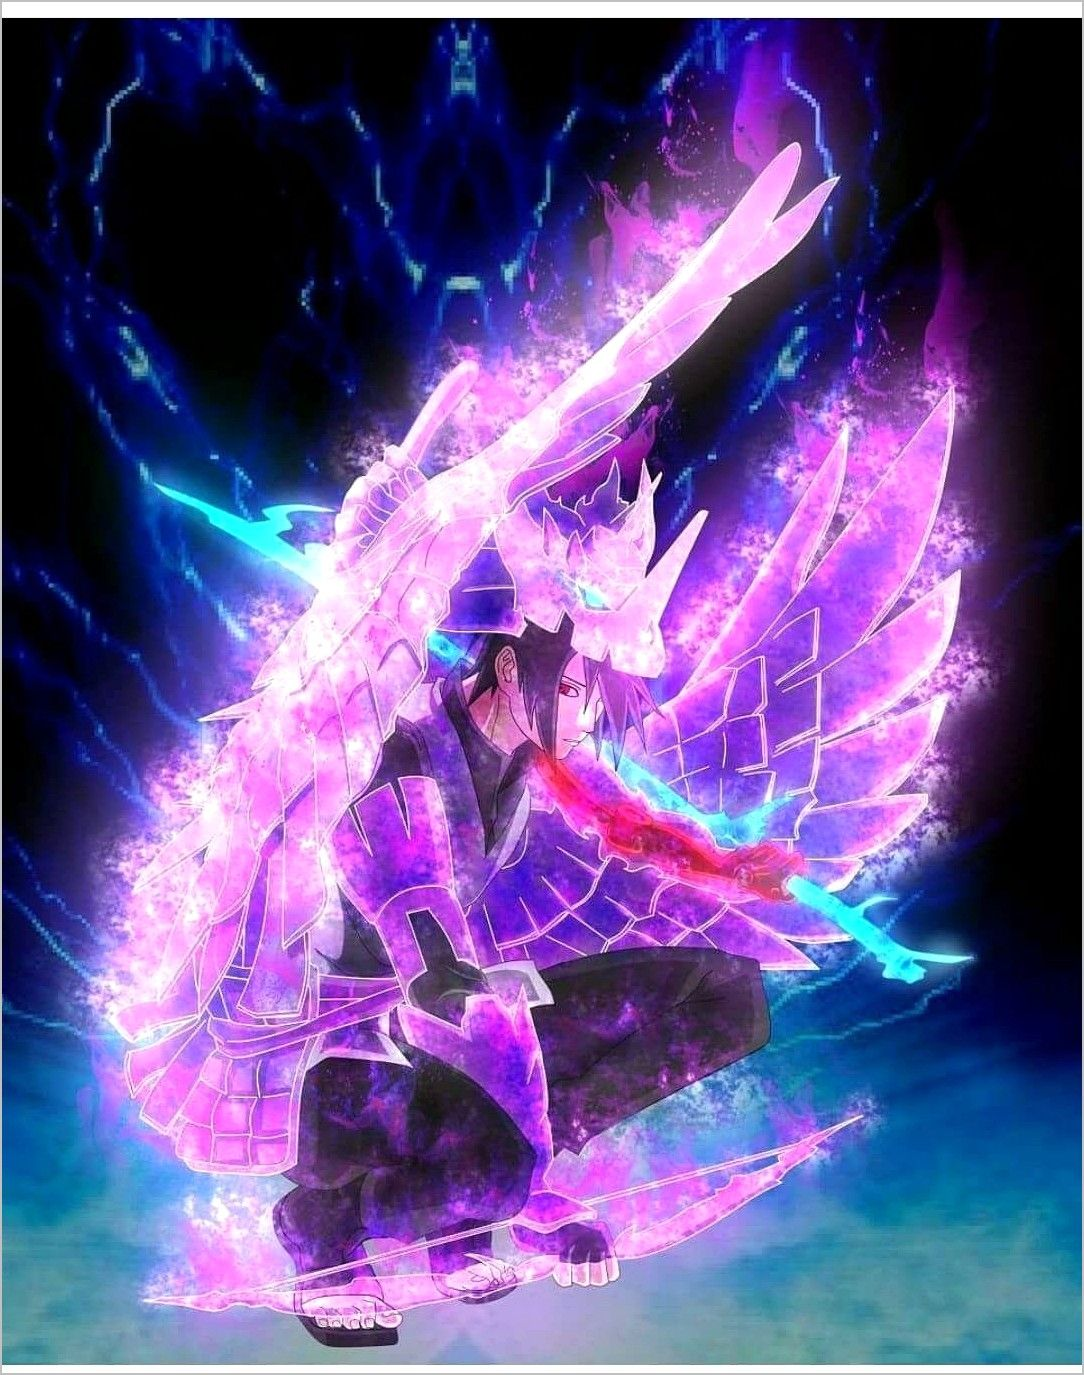 Best 4k Wallpapers Sasuke Final Form In 2020 Naruto Dan Sasuke Naruto Shippuden Anime Sasuke Uchiha Sharingan